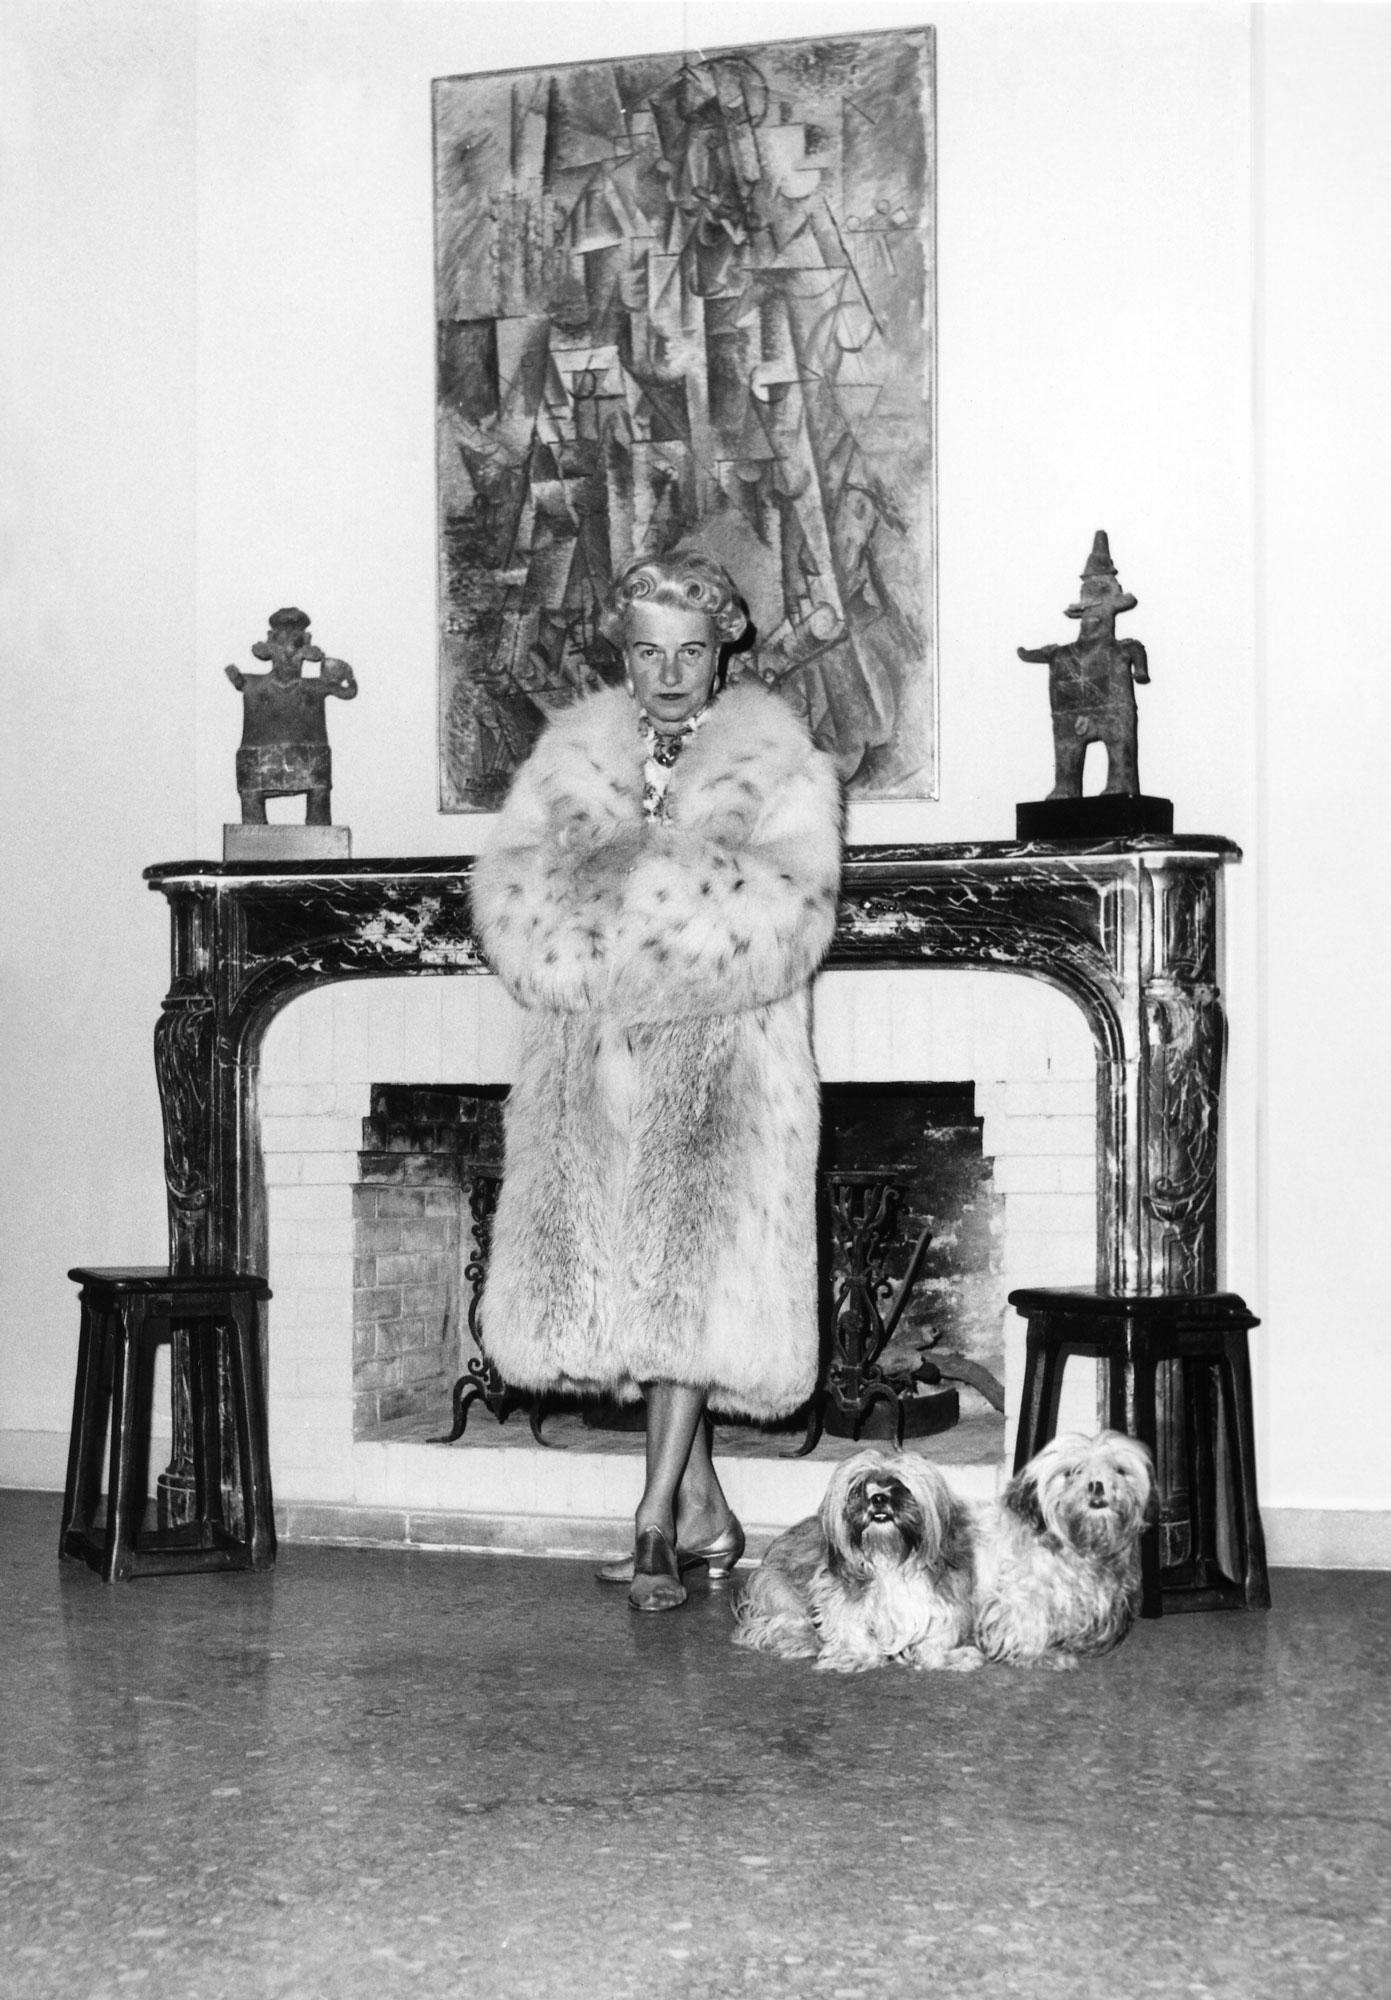 Peggy Guggenheim Art Addict Takes On Her Wild Strange